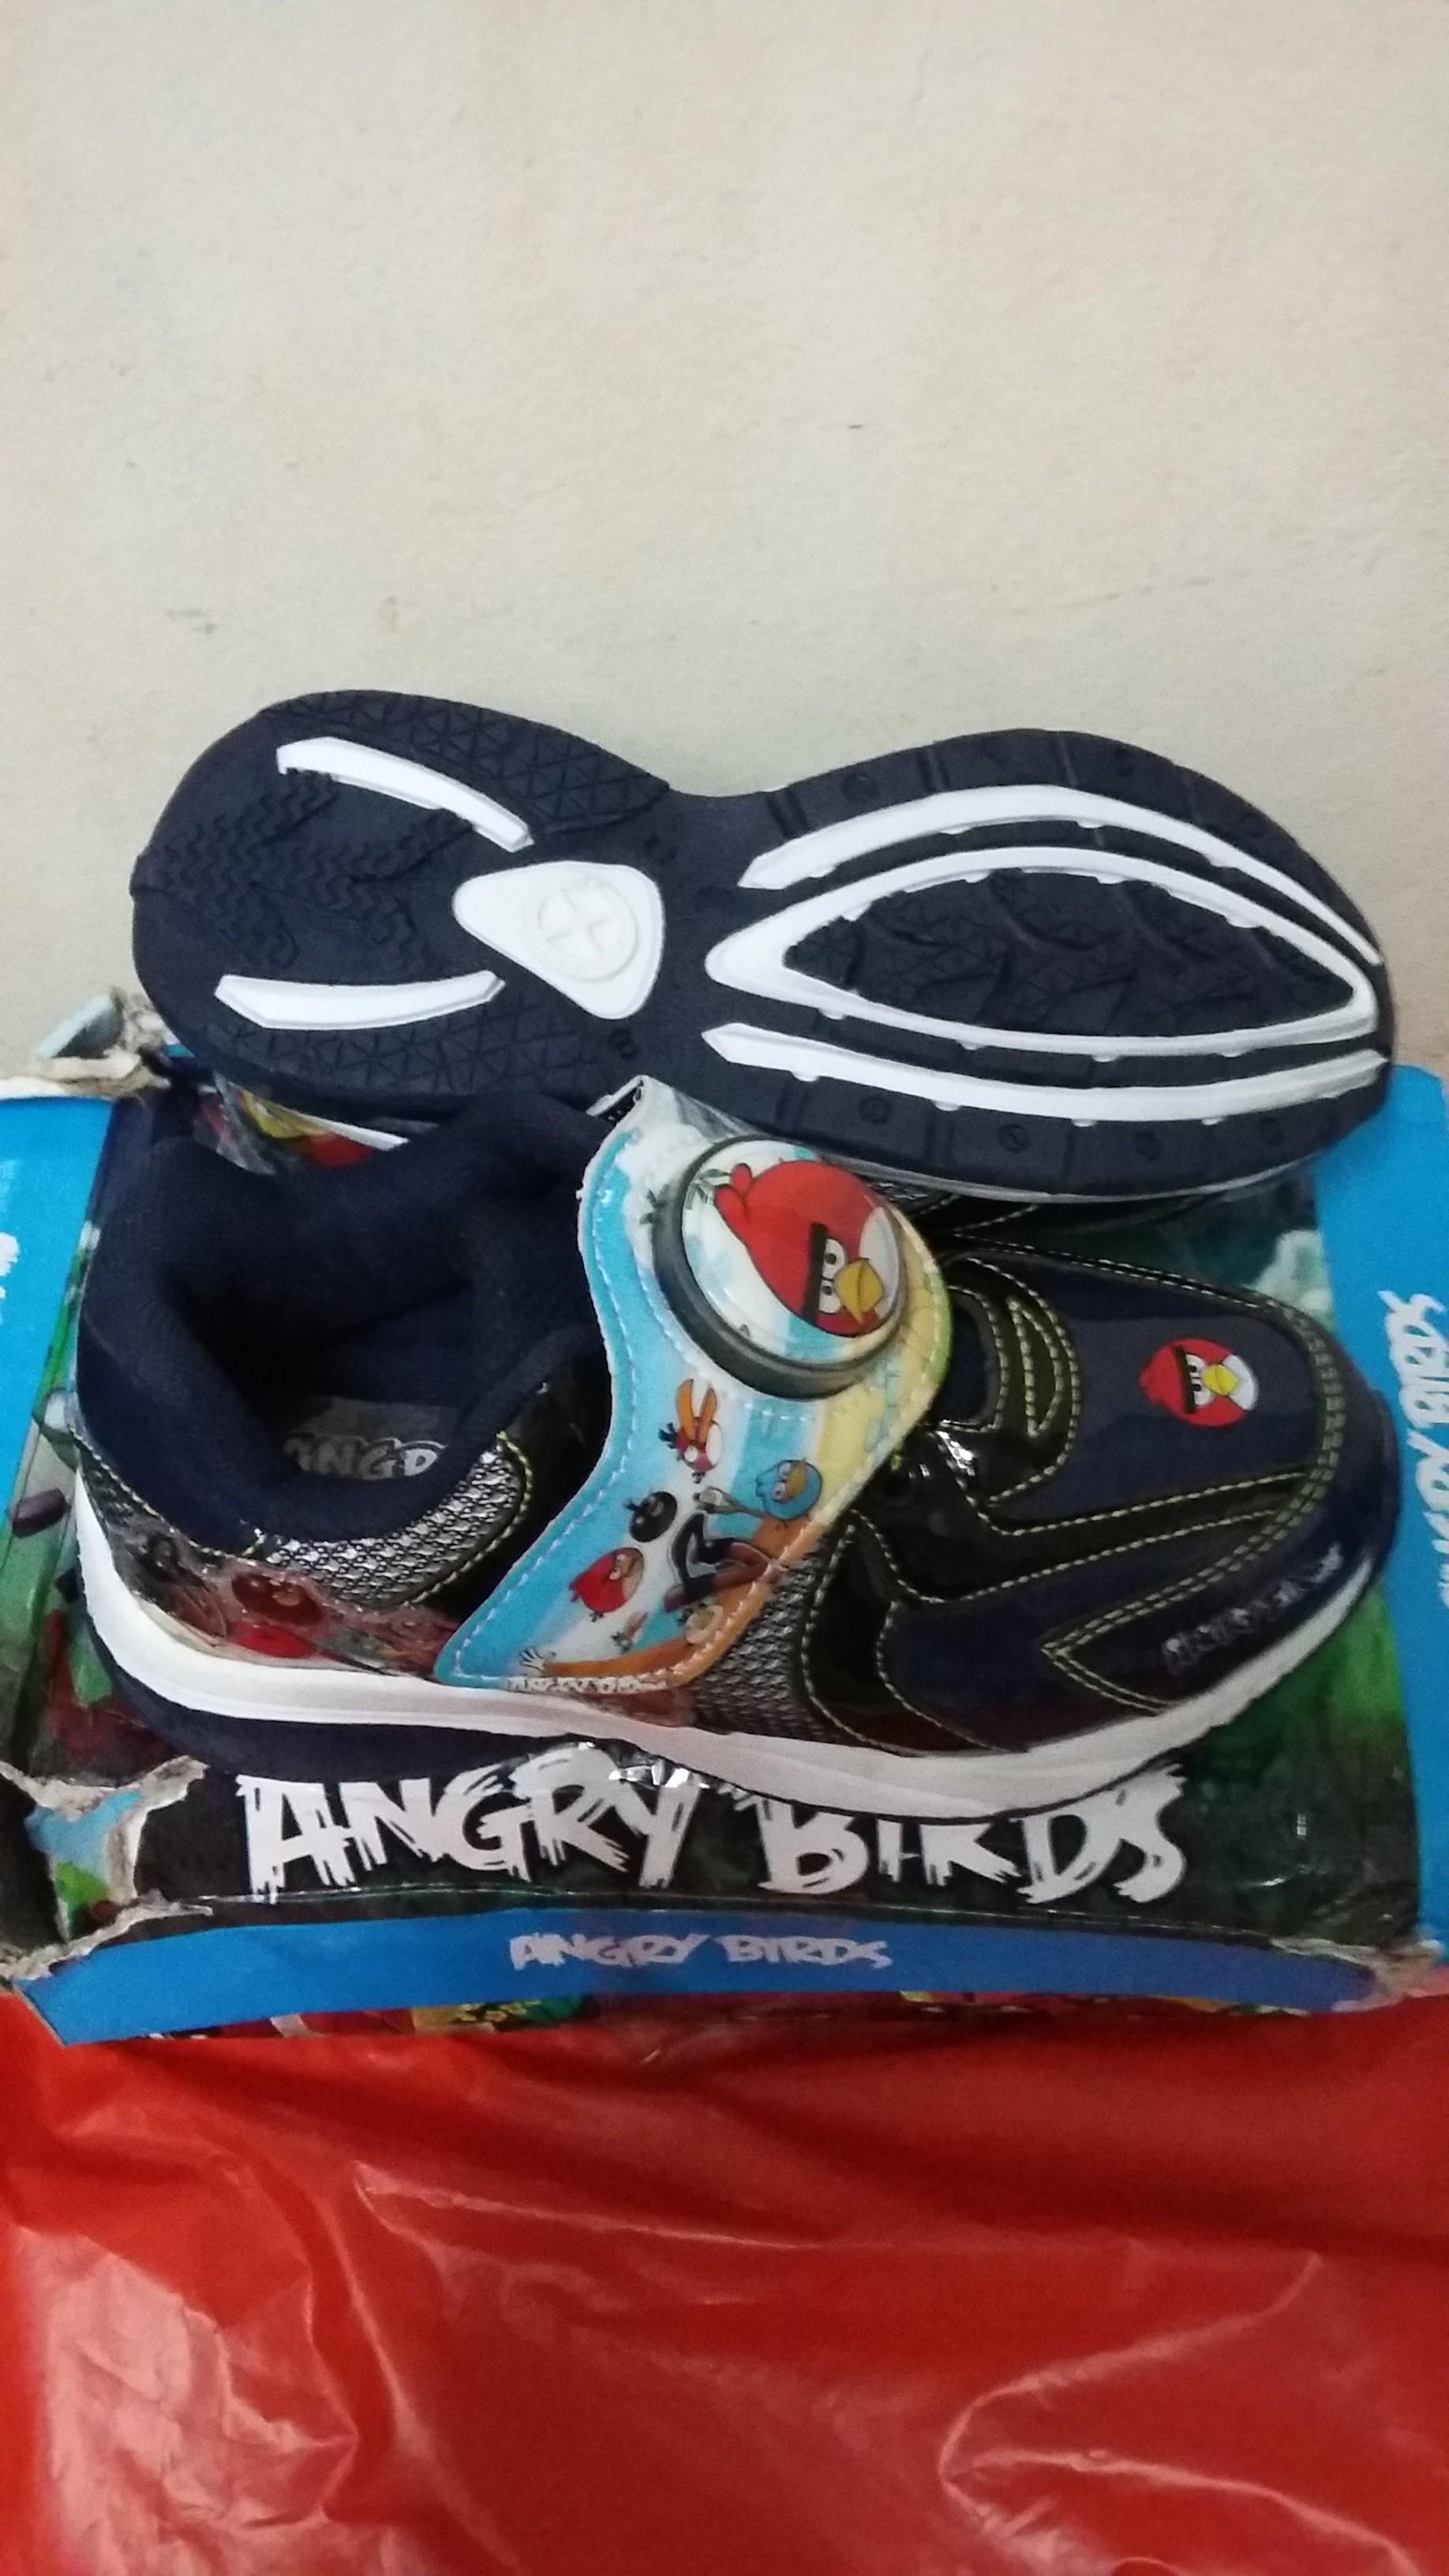 Grosir Sepatu Roda Just Another Wordpresscom Site Anak Cewek Warna Ungu Gambar Angry Bird Biru Abu Prepet Ada Lampu No 25